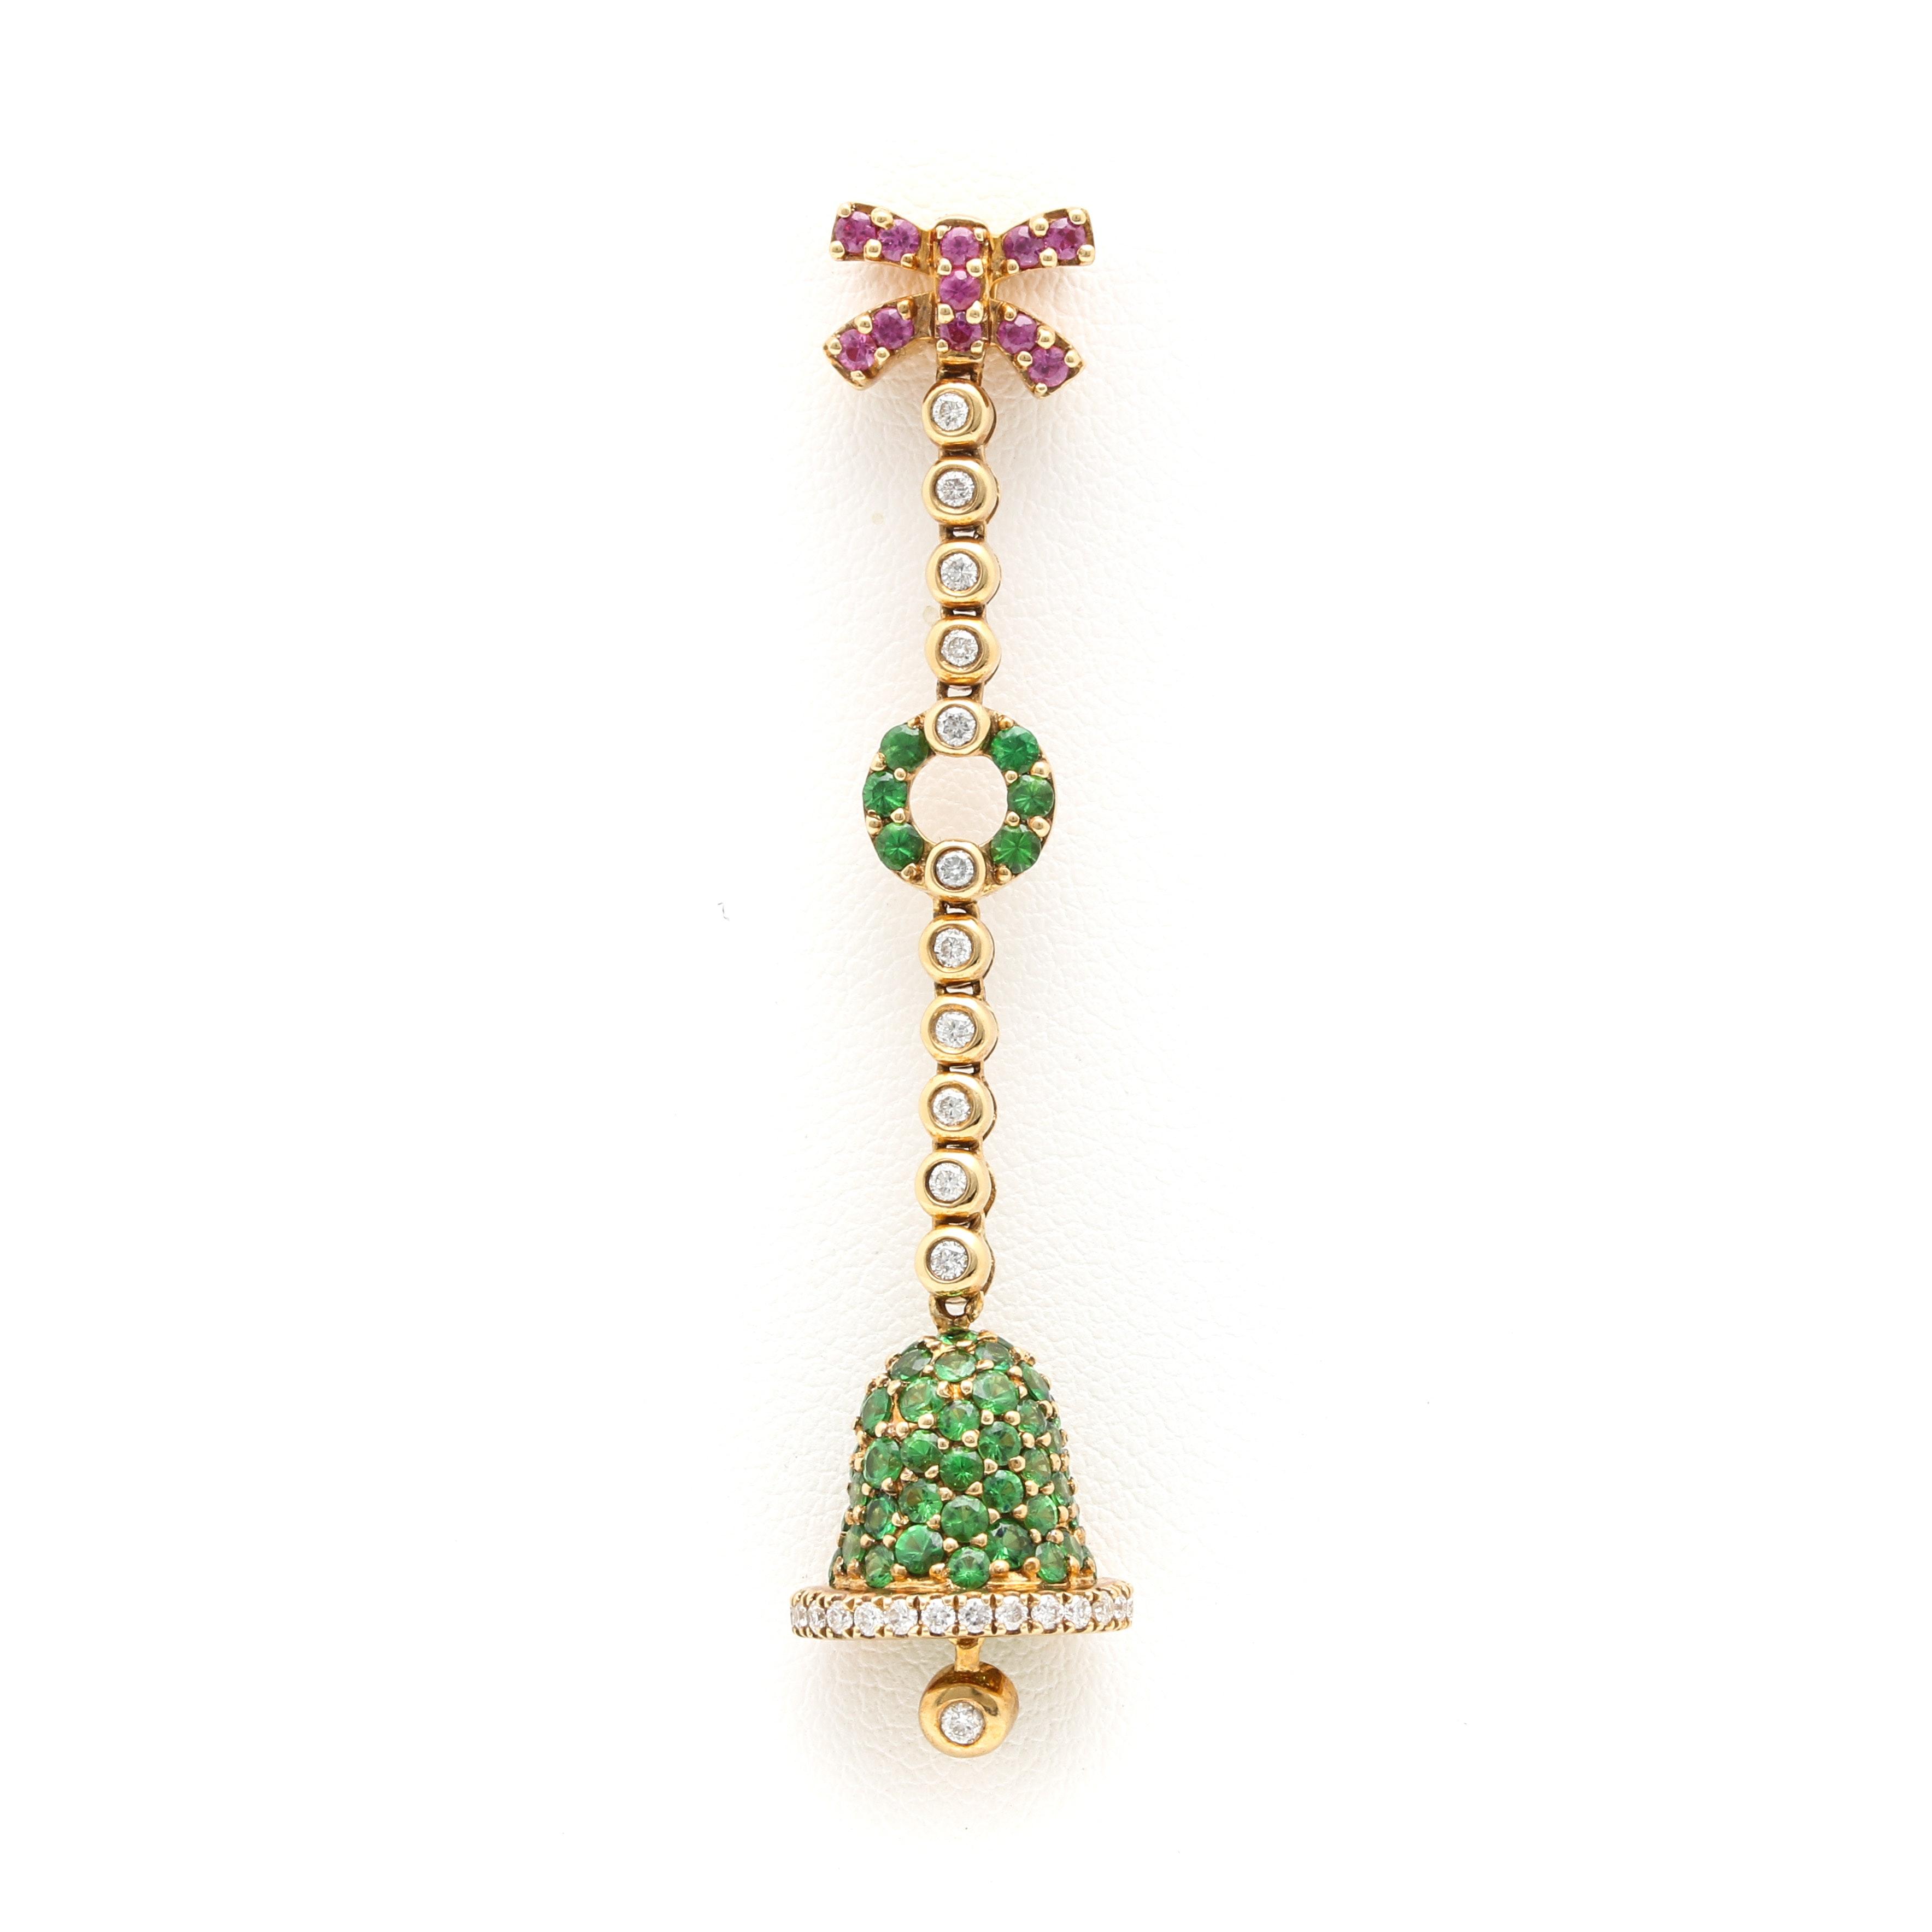 18K Yellow Gold Pink Sapphire, Diamond and Tsavorite Garnet Bell Pendant